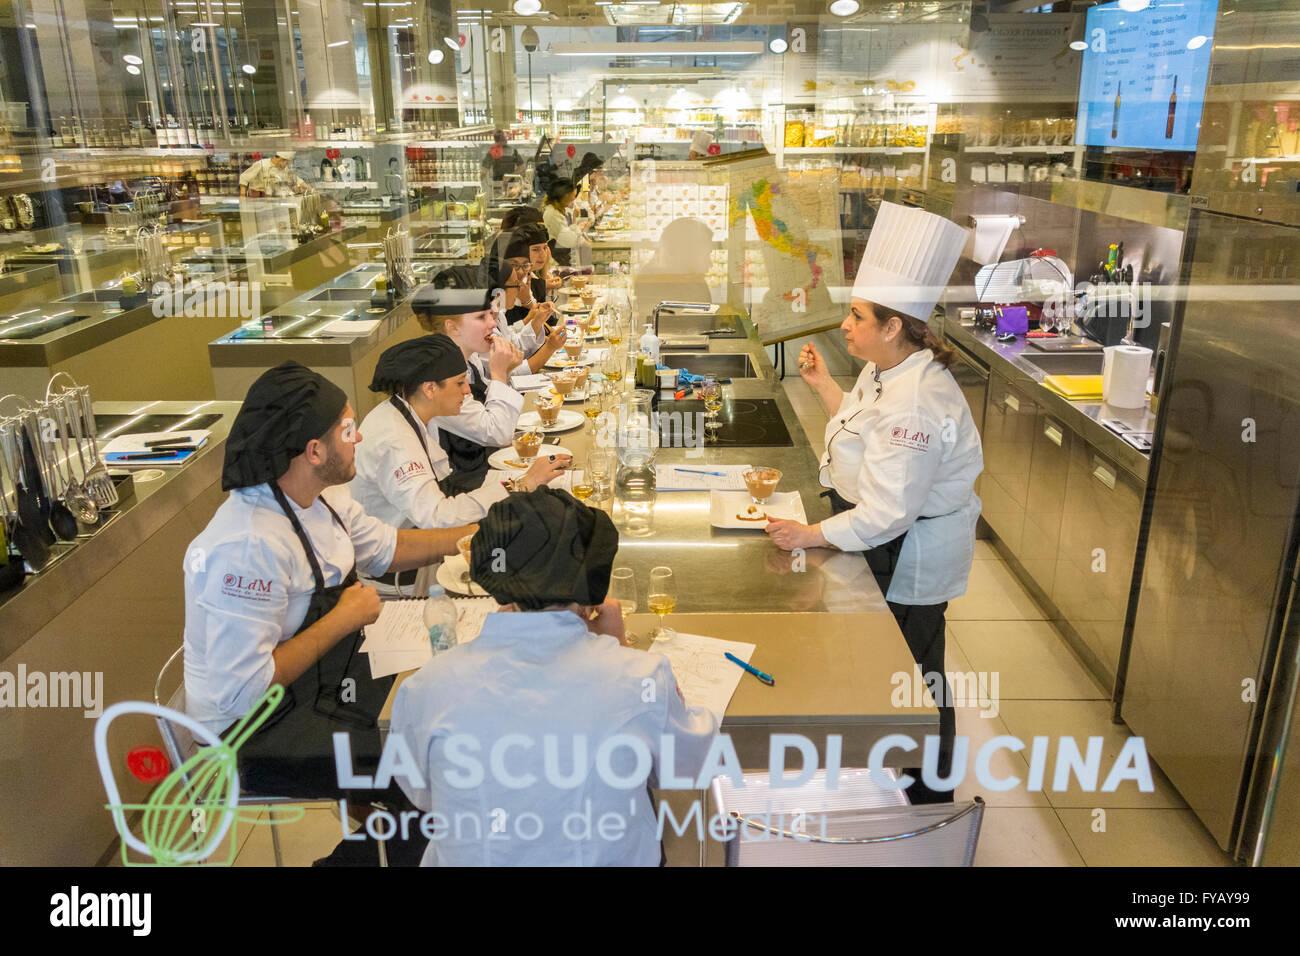 https://c7.alamy.com/comp/FYAY99/florence-italy-cookery-class-la-scuola-di-cucina-of-the-scuola-lorenzo-FYAY99.jpg